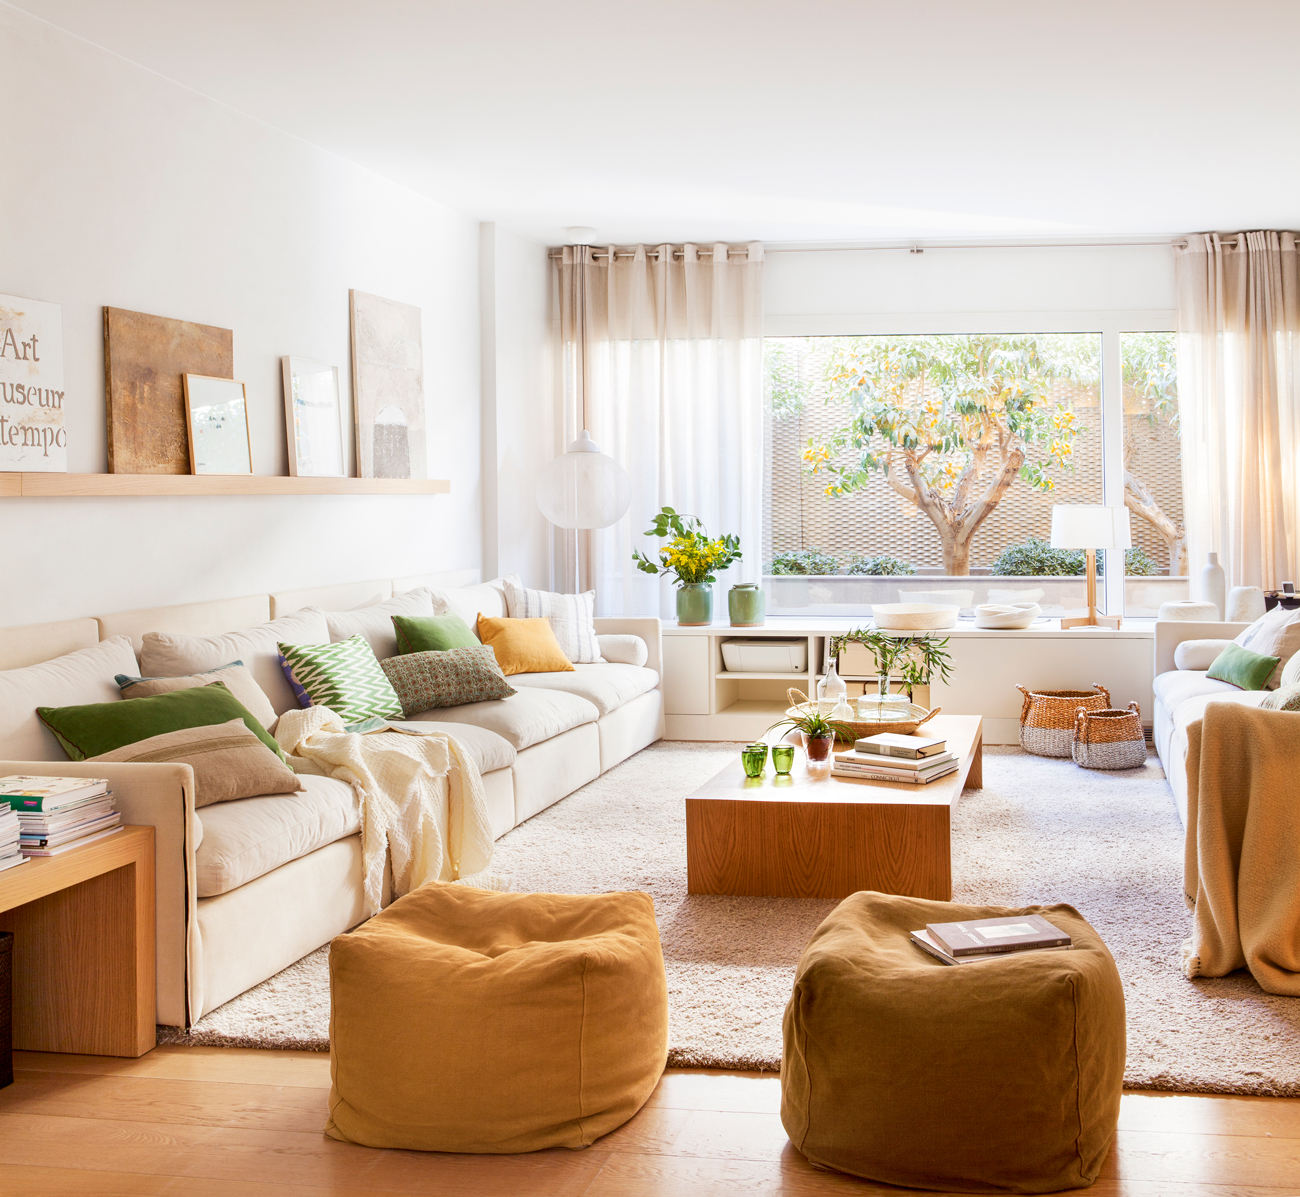 Salones peque os con muebles que aprovechan cada cent metro - Como decorar un mueble de salon ...